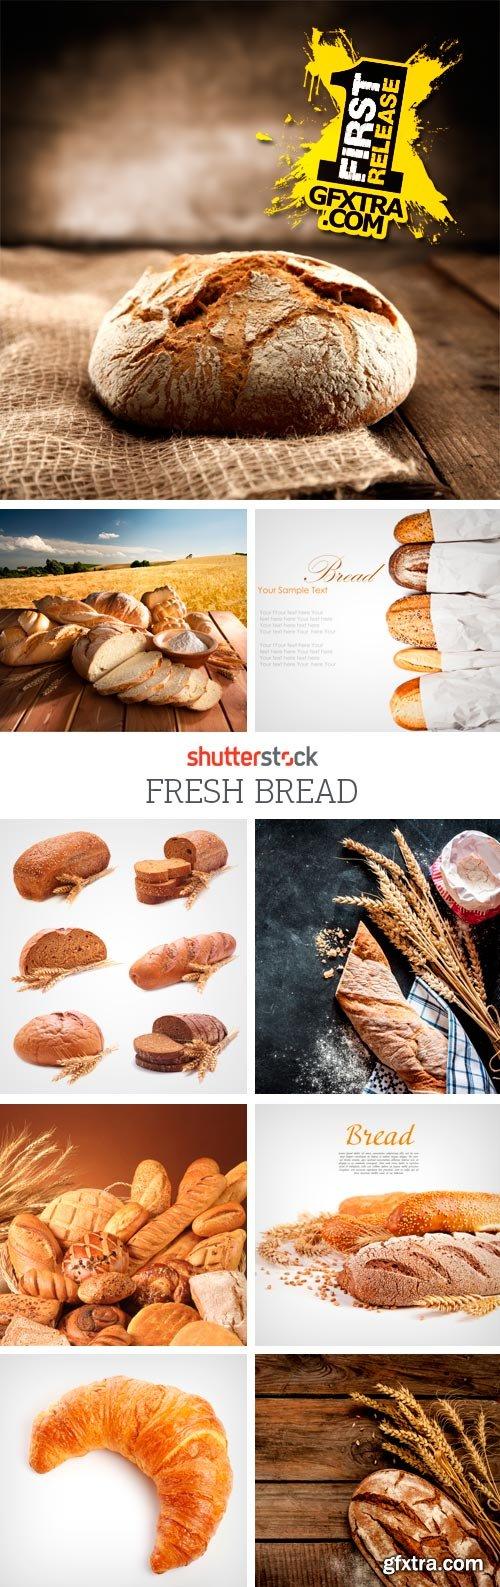 Amazing SS - Fresh Bread, 25xJPGs